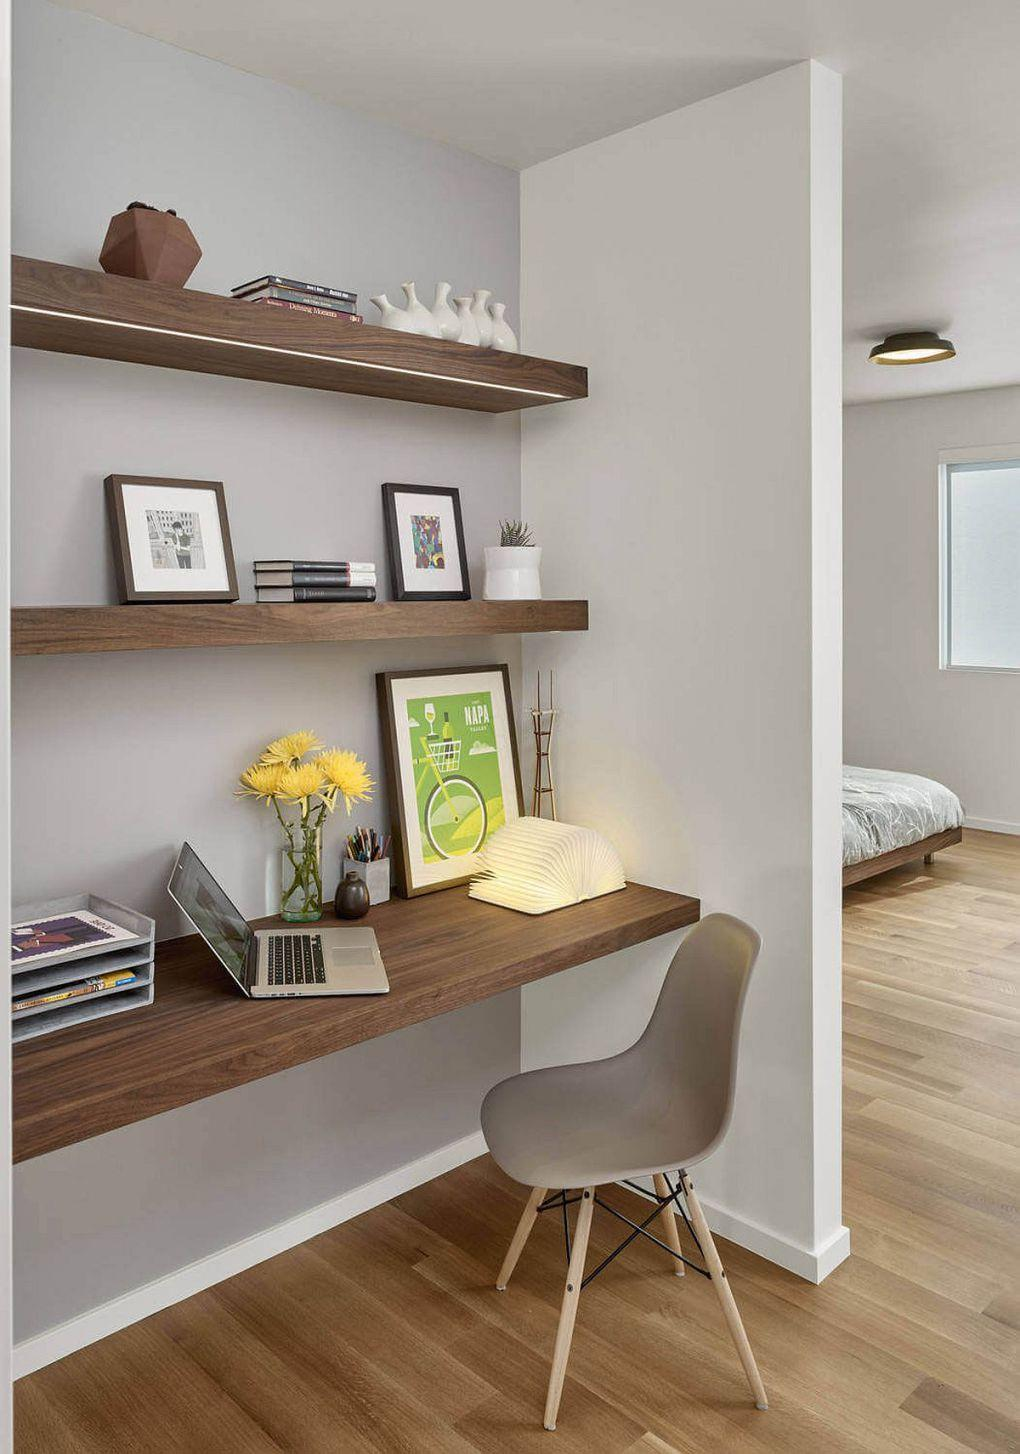 Kaliforniya Evleri | Small workspace in the bedroom corner with floating wooden shelves 1